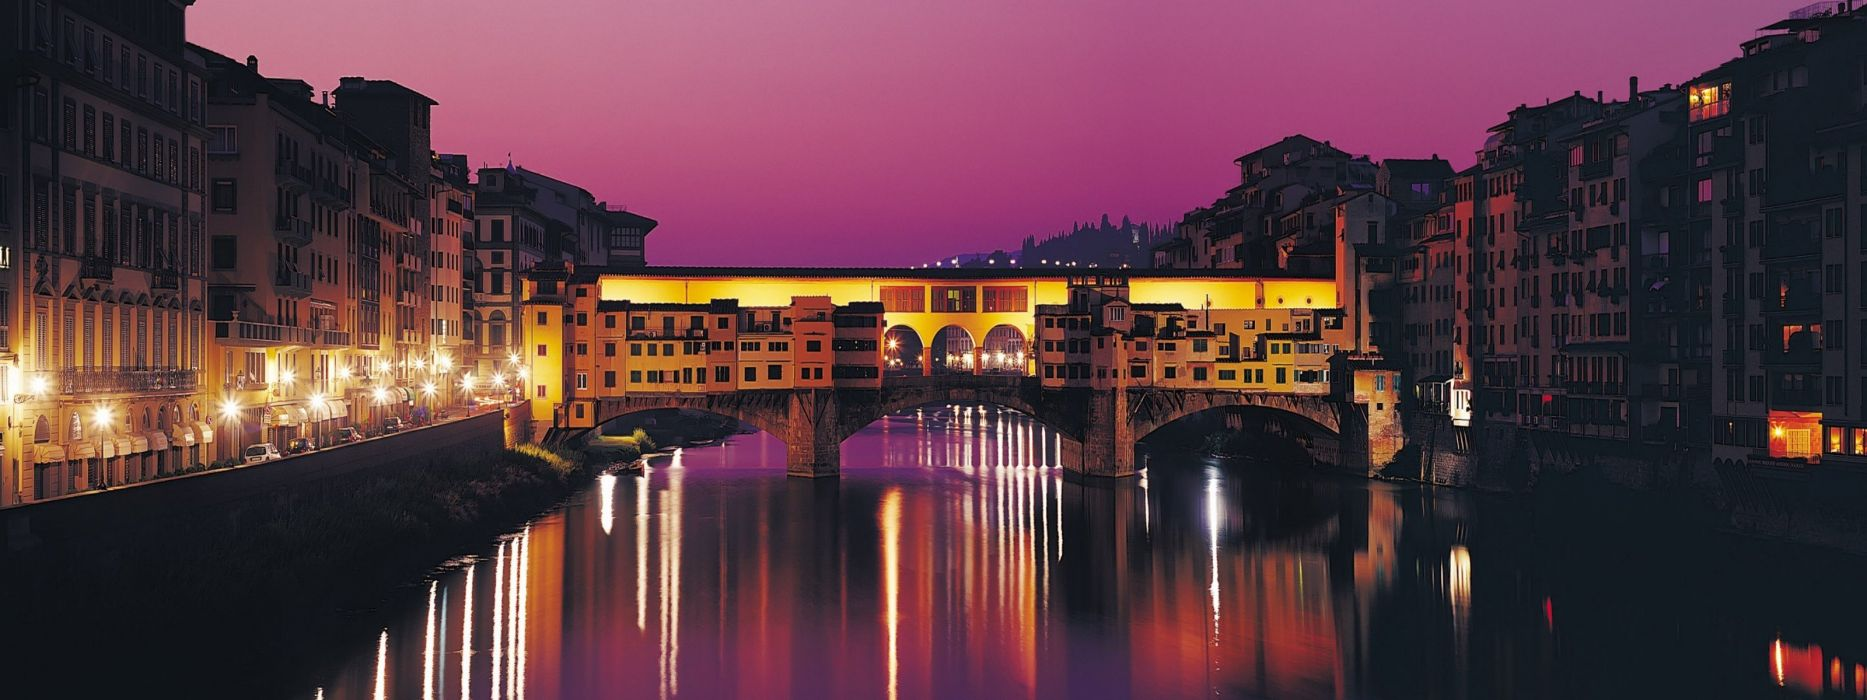 bridges Italy Florence Ponte Vecchio rivers reflections wallpaper